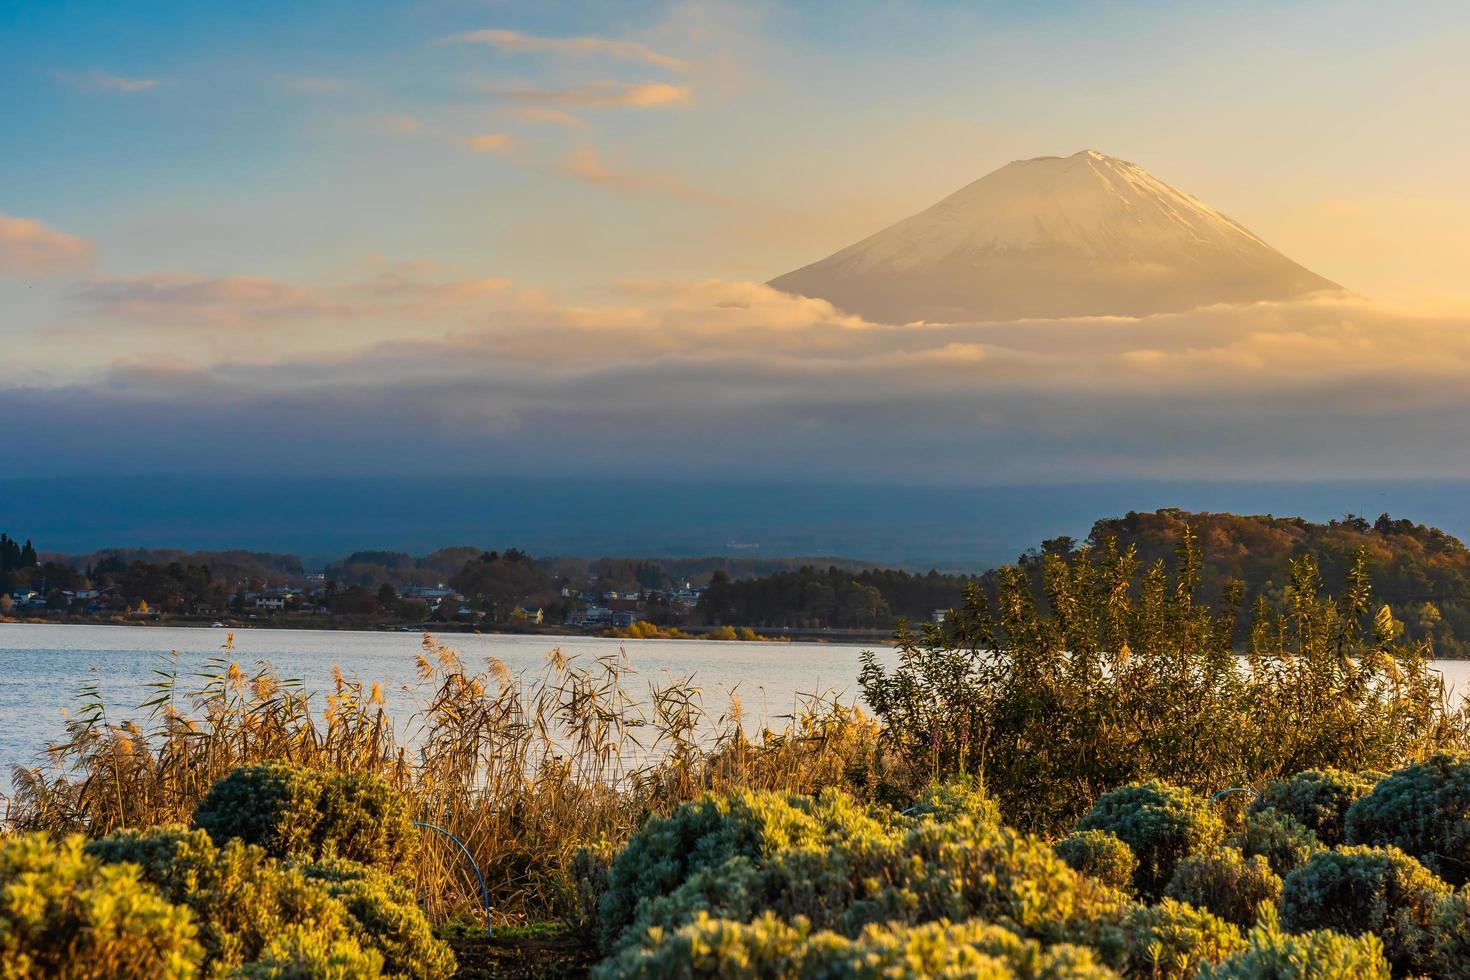 bela paisagem em mt. fuji, japão foto